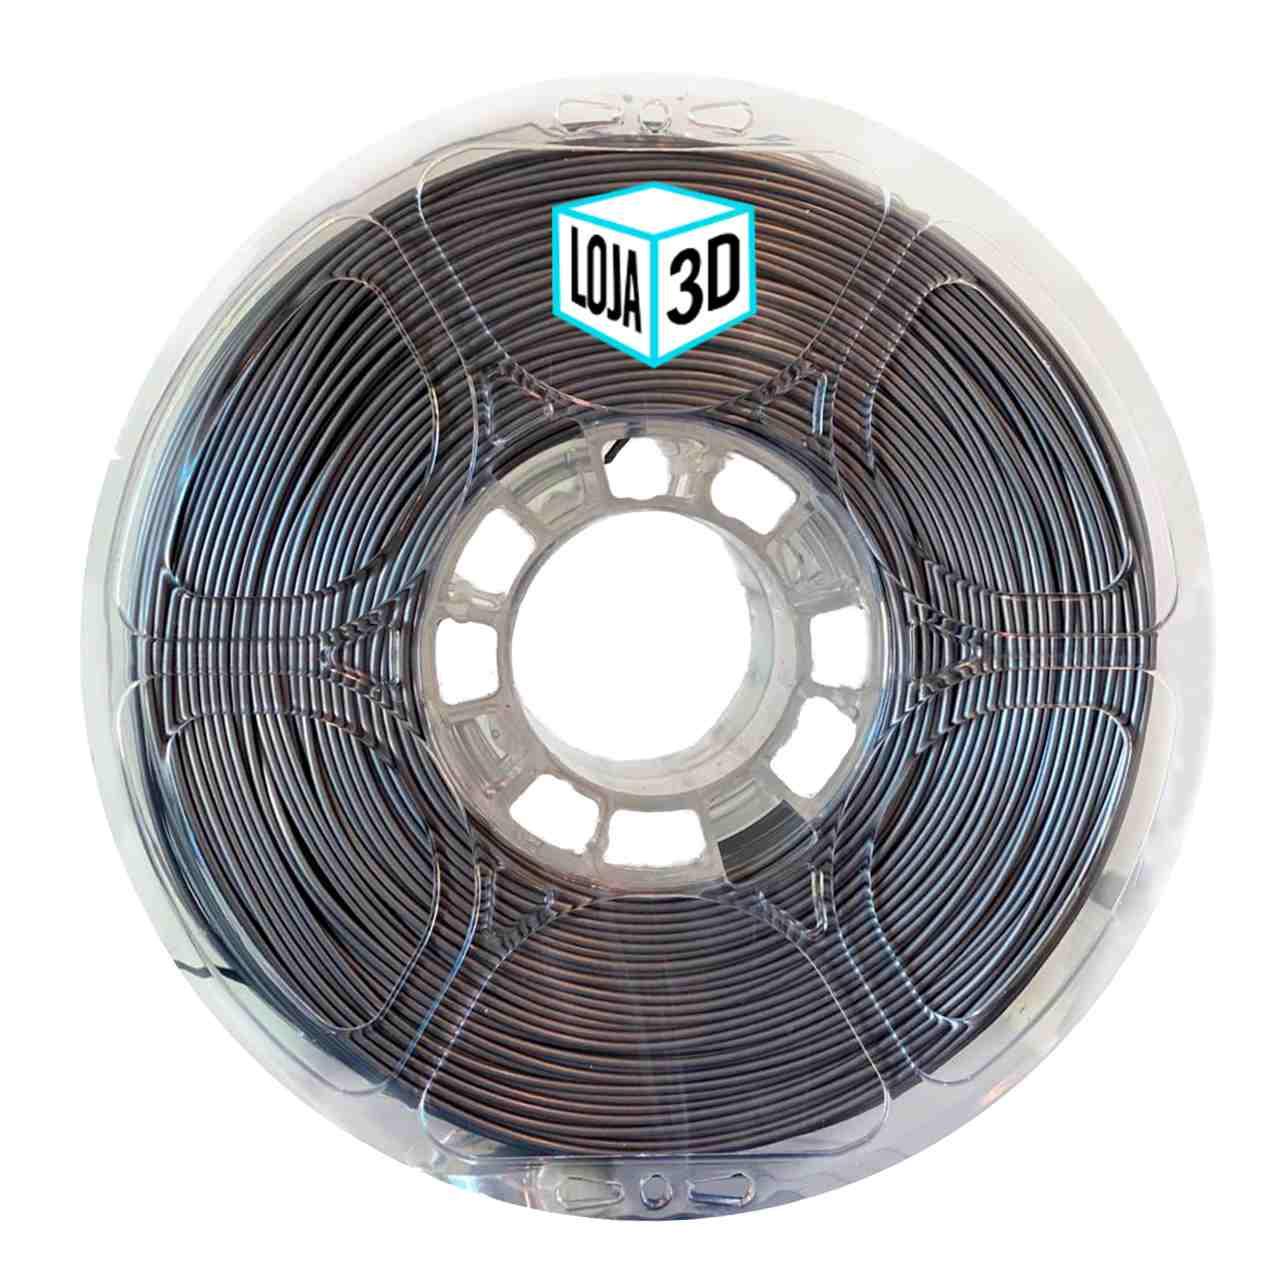 Filamento PET-G Pro - Prata - Loja 3D - 1.75mm - 1kg